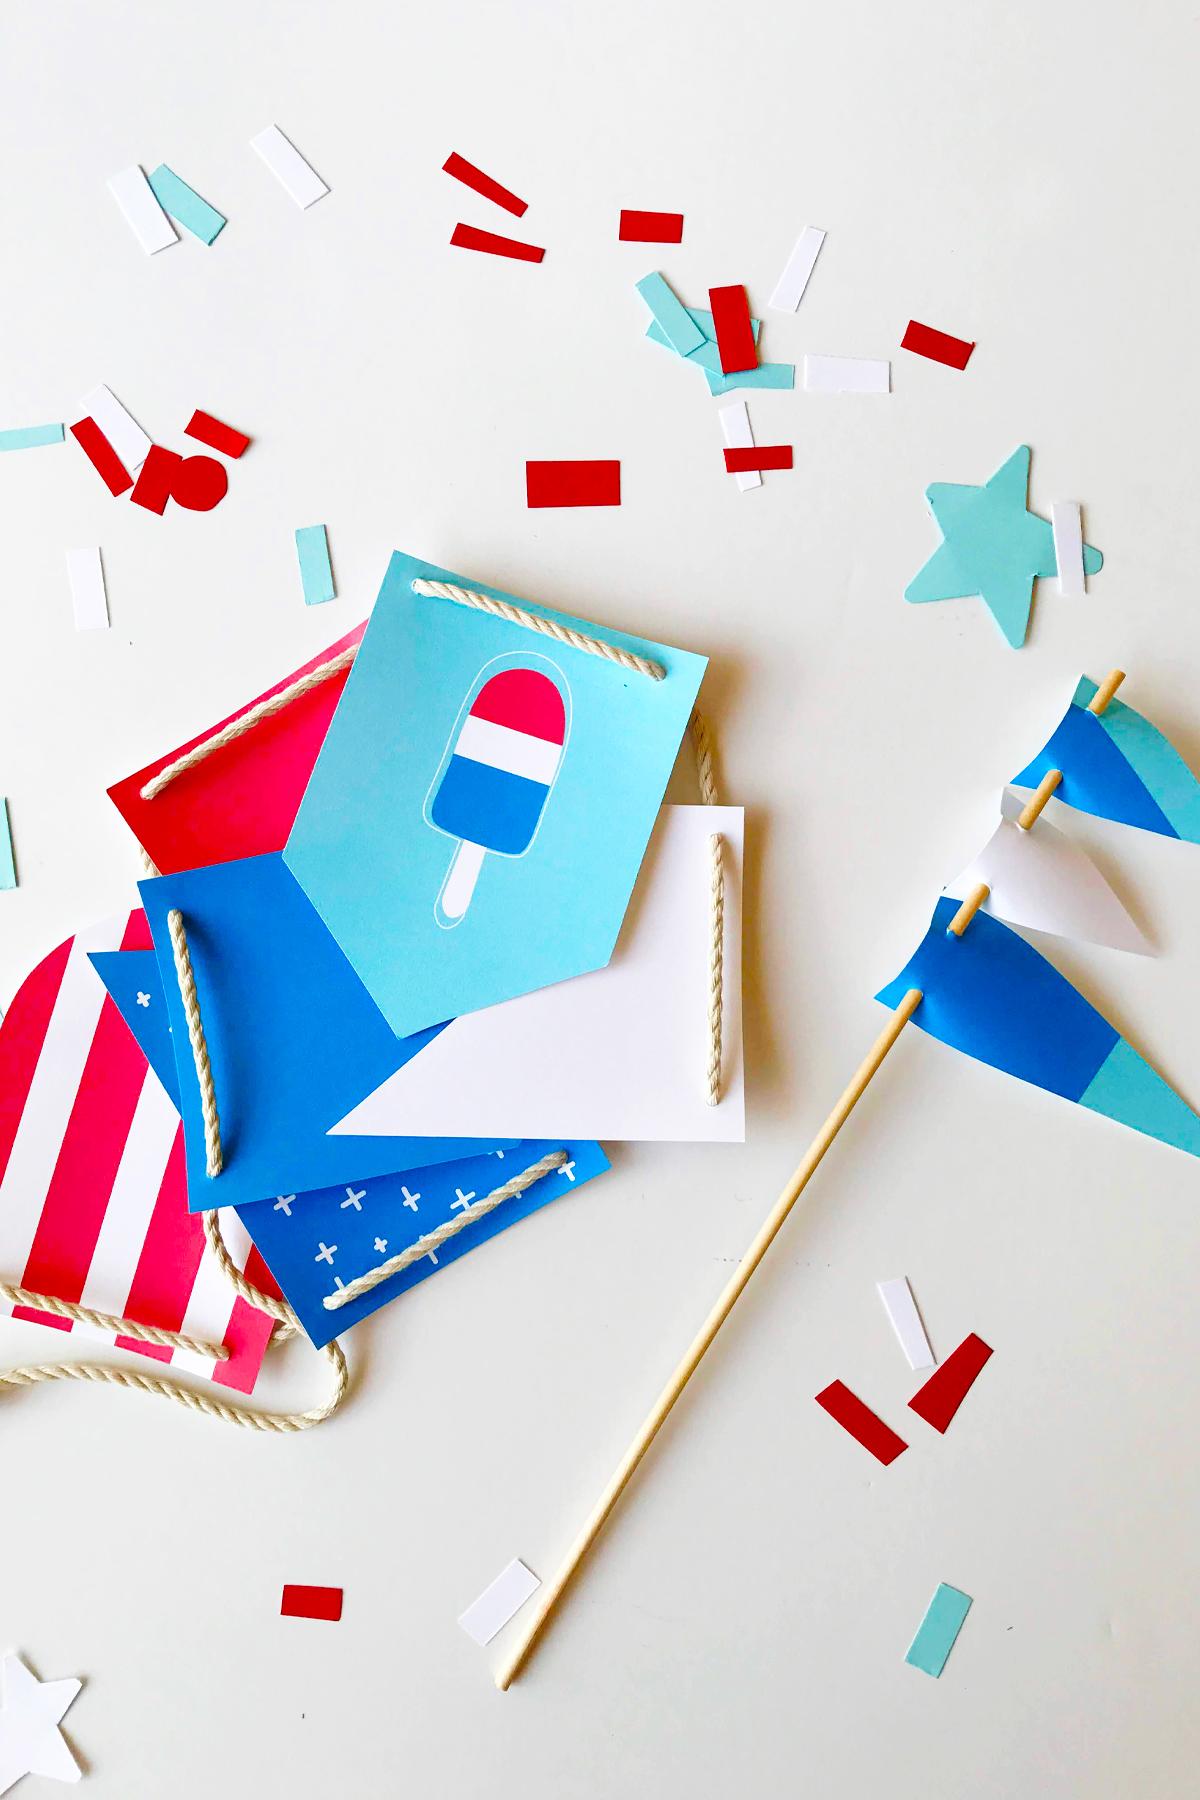 02_so_many_hoorays_4th_flags_post.jpg